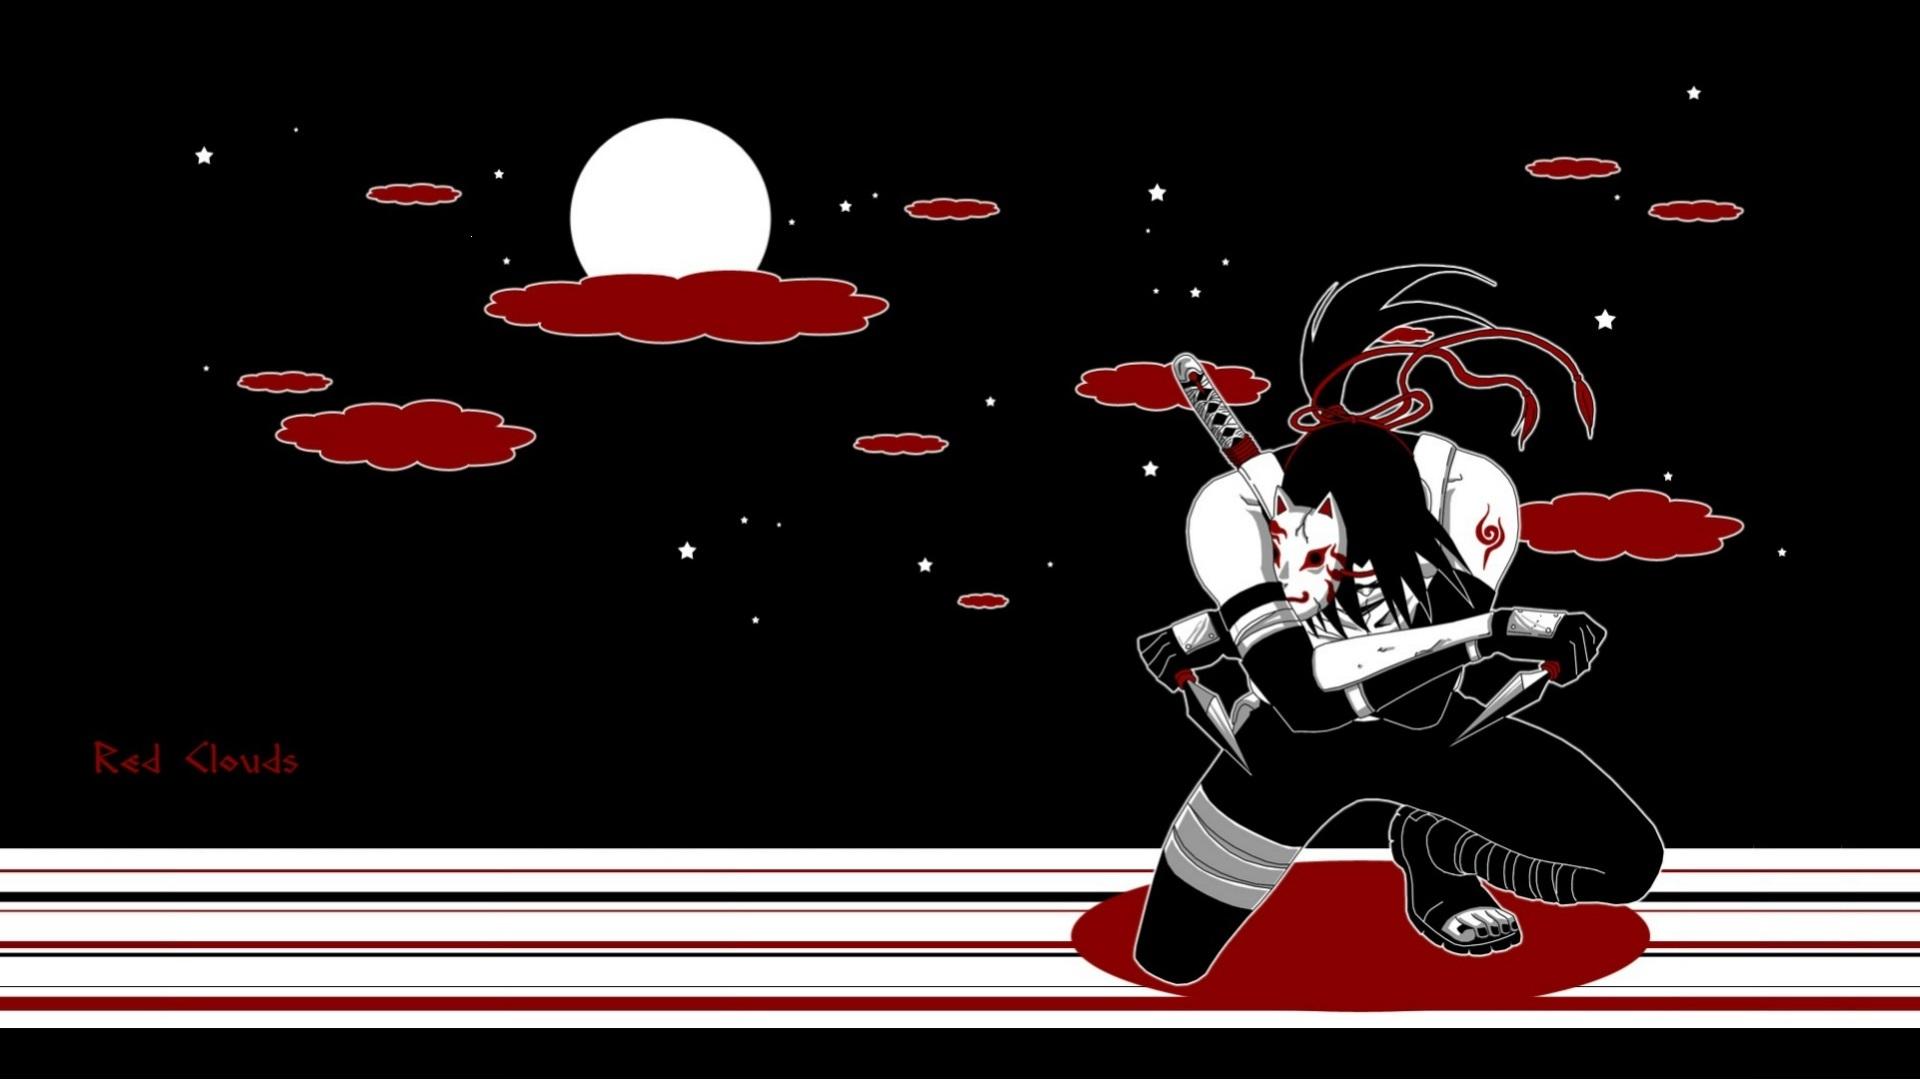 Download Wallpaper Night Loneliness The Full Moon Naruto Bandages Mercenary Itachi Uchiha Naruto Shippuden Demon Mask Kunai Anbu Bloody Clouds Section Shonen In Resolution 1920x1080